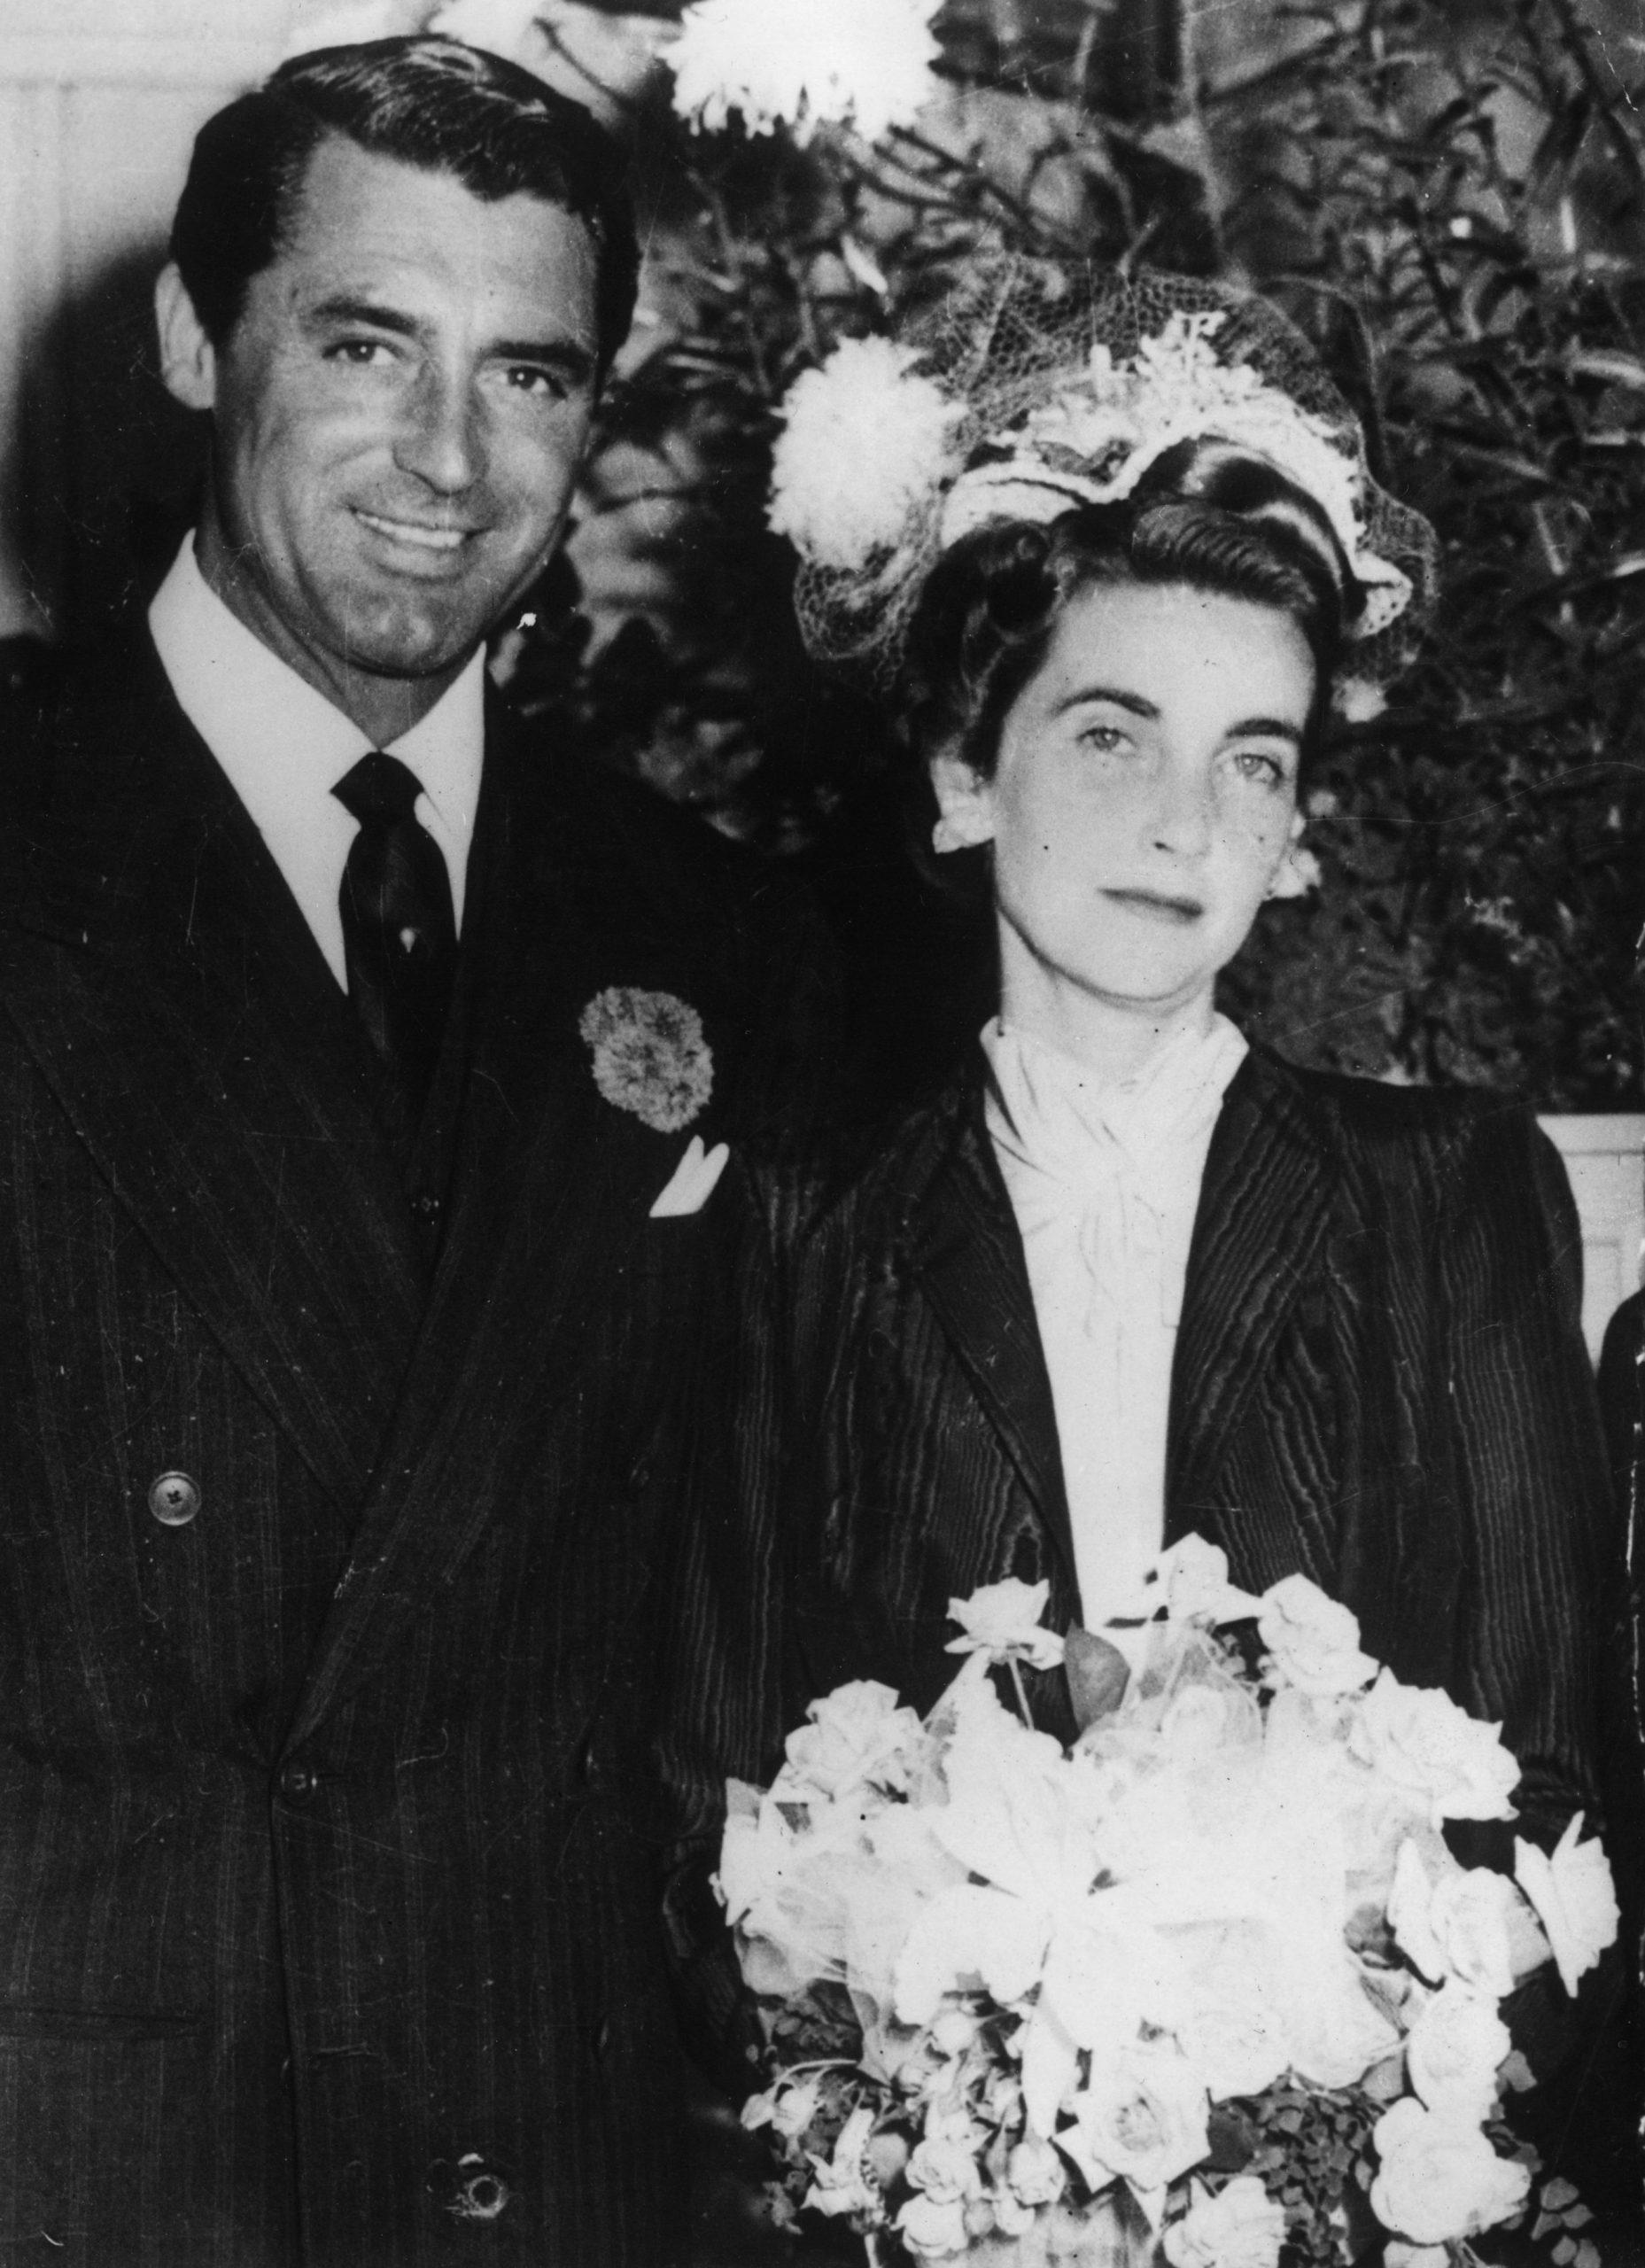 Cary Grant junto a su mujer Barbara Hutton. Ella se casó siete veces, Cary era su tercer marido. / Foto: Getty Images